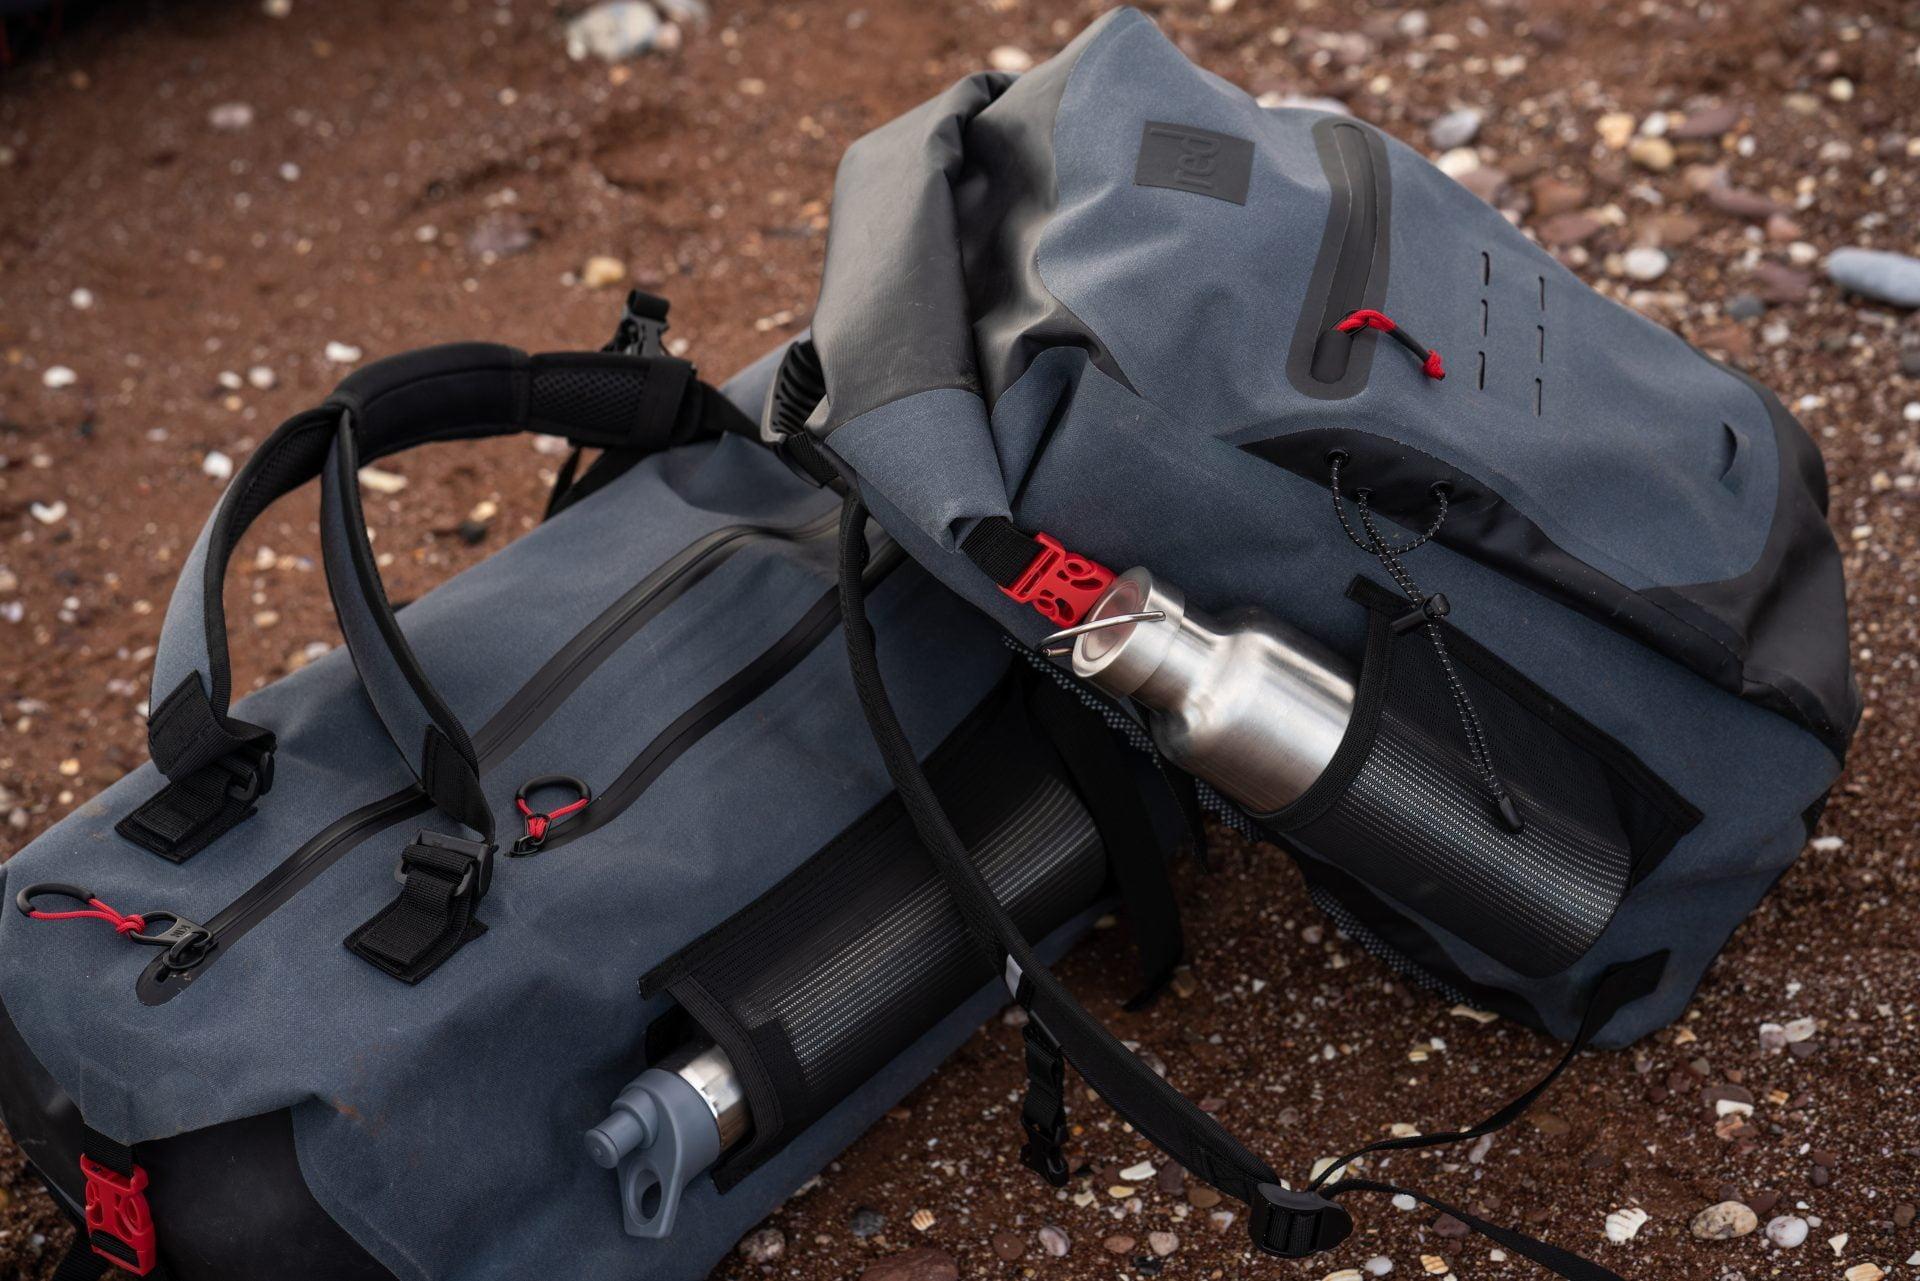 Red Original kit bag 40L & Red Original Backpack 30L